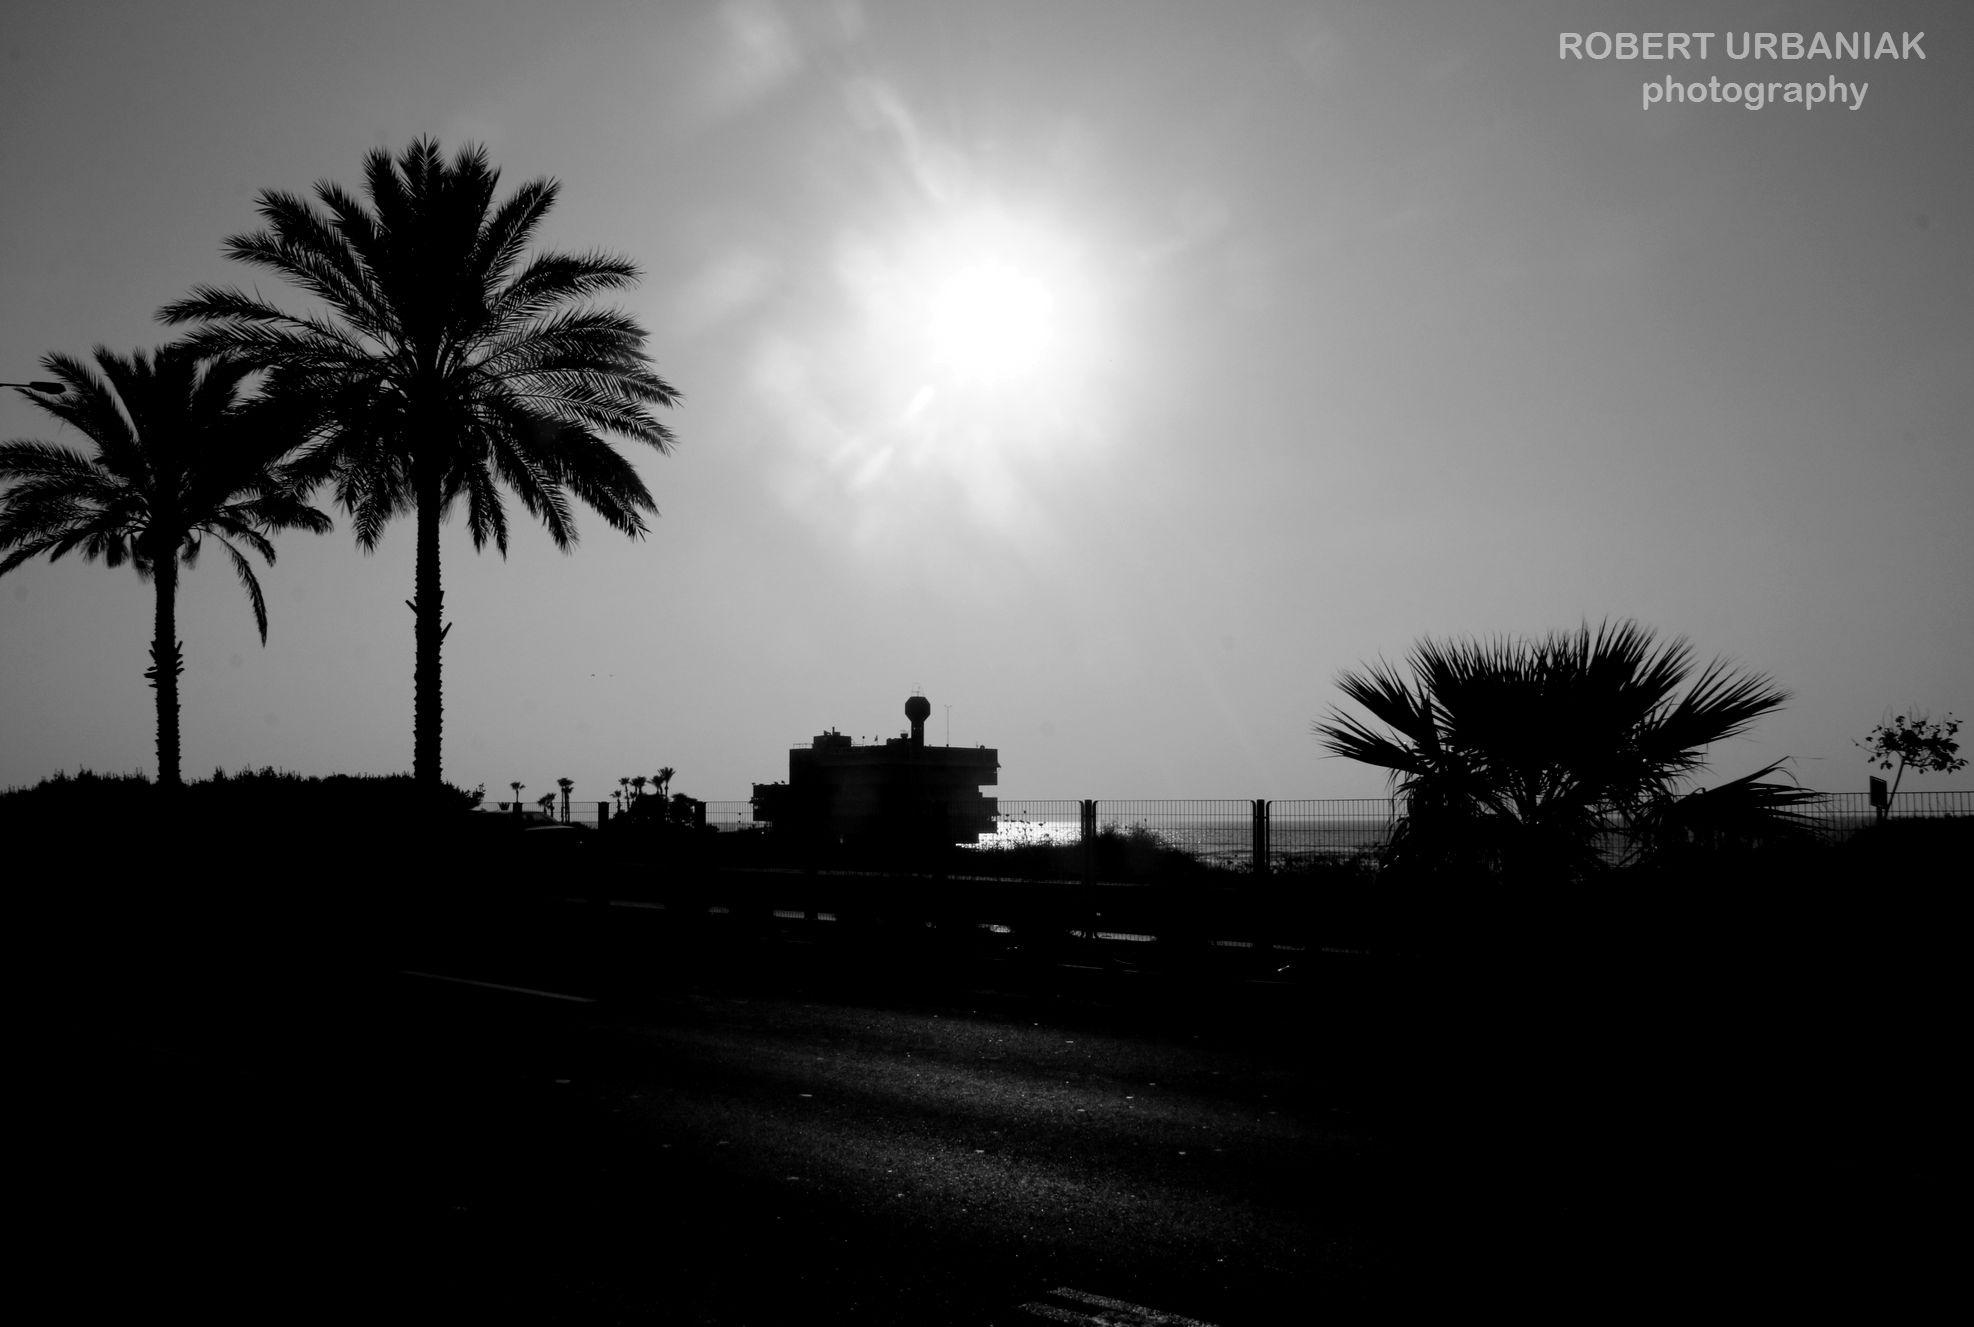 on the road by Robert Urbaniak